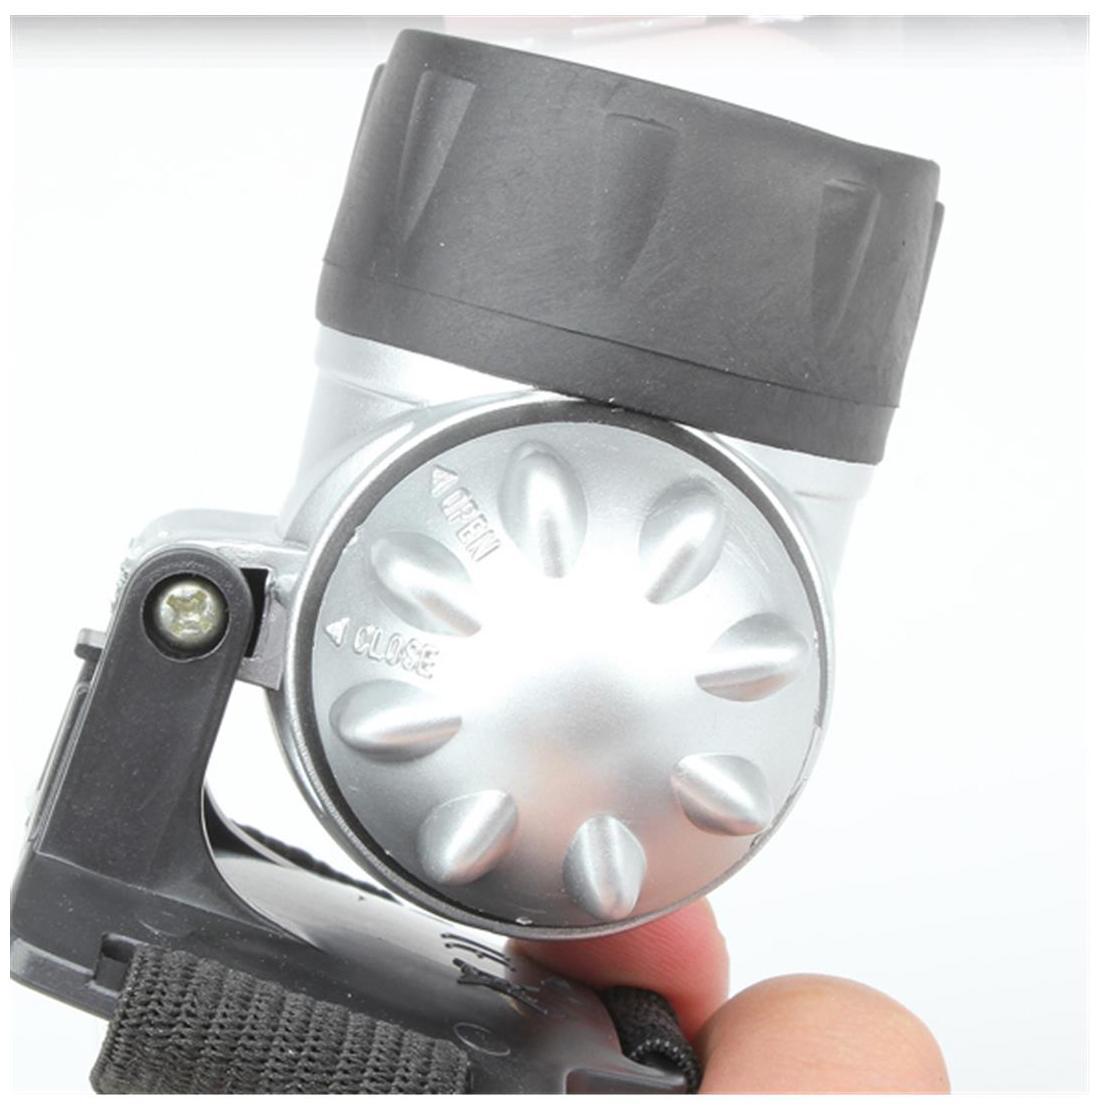 https://assetscdn1.paytm.com/images/catalog/product/S/SP/SPO7-LED-HEAD-LR-R-30749493F8F752/a_0..jpg